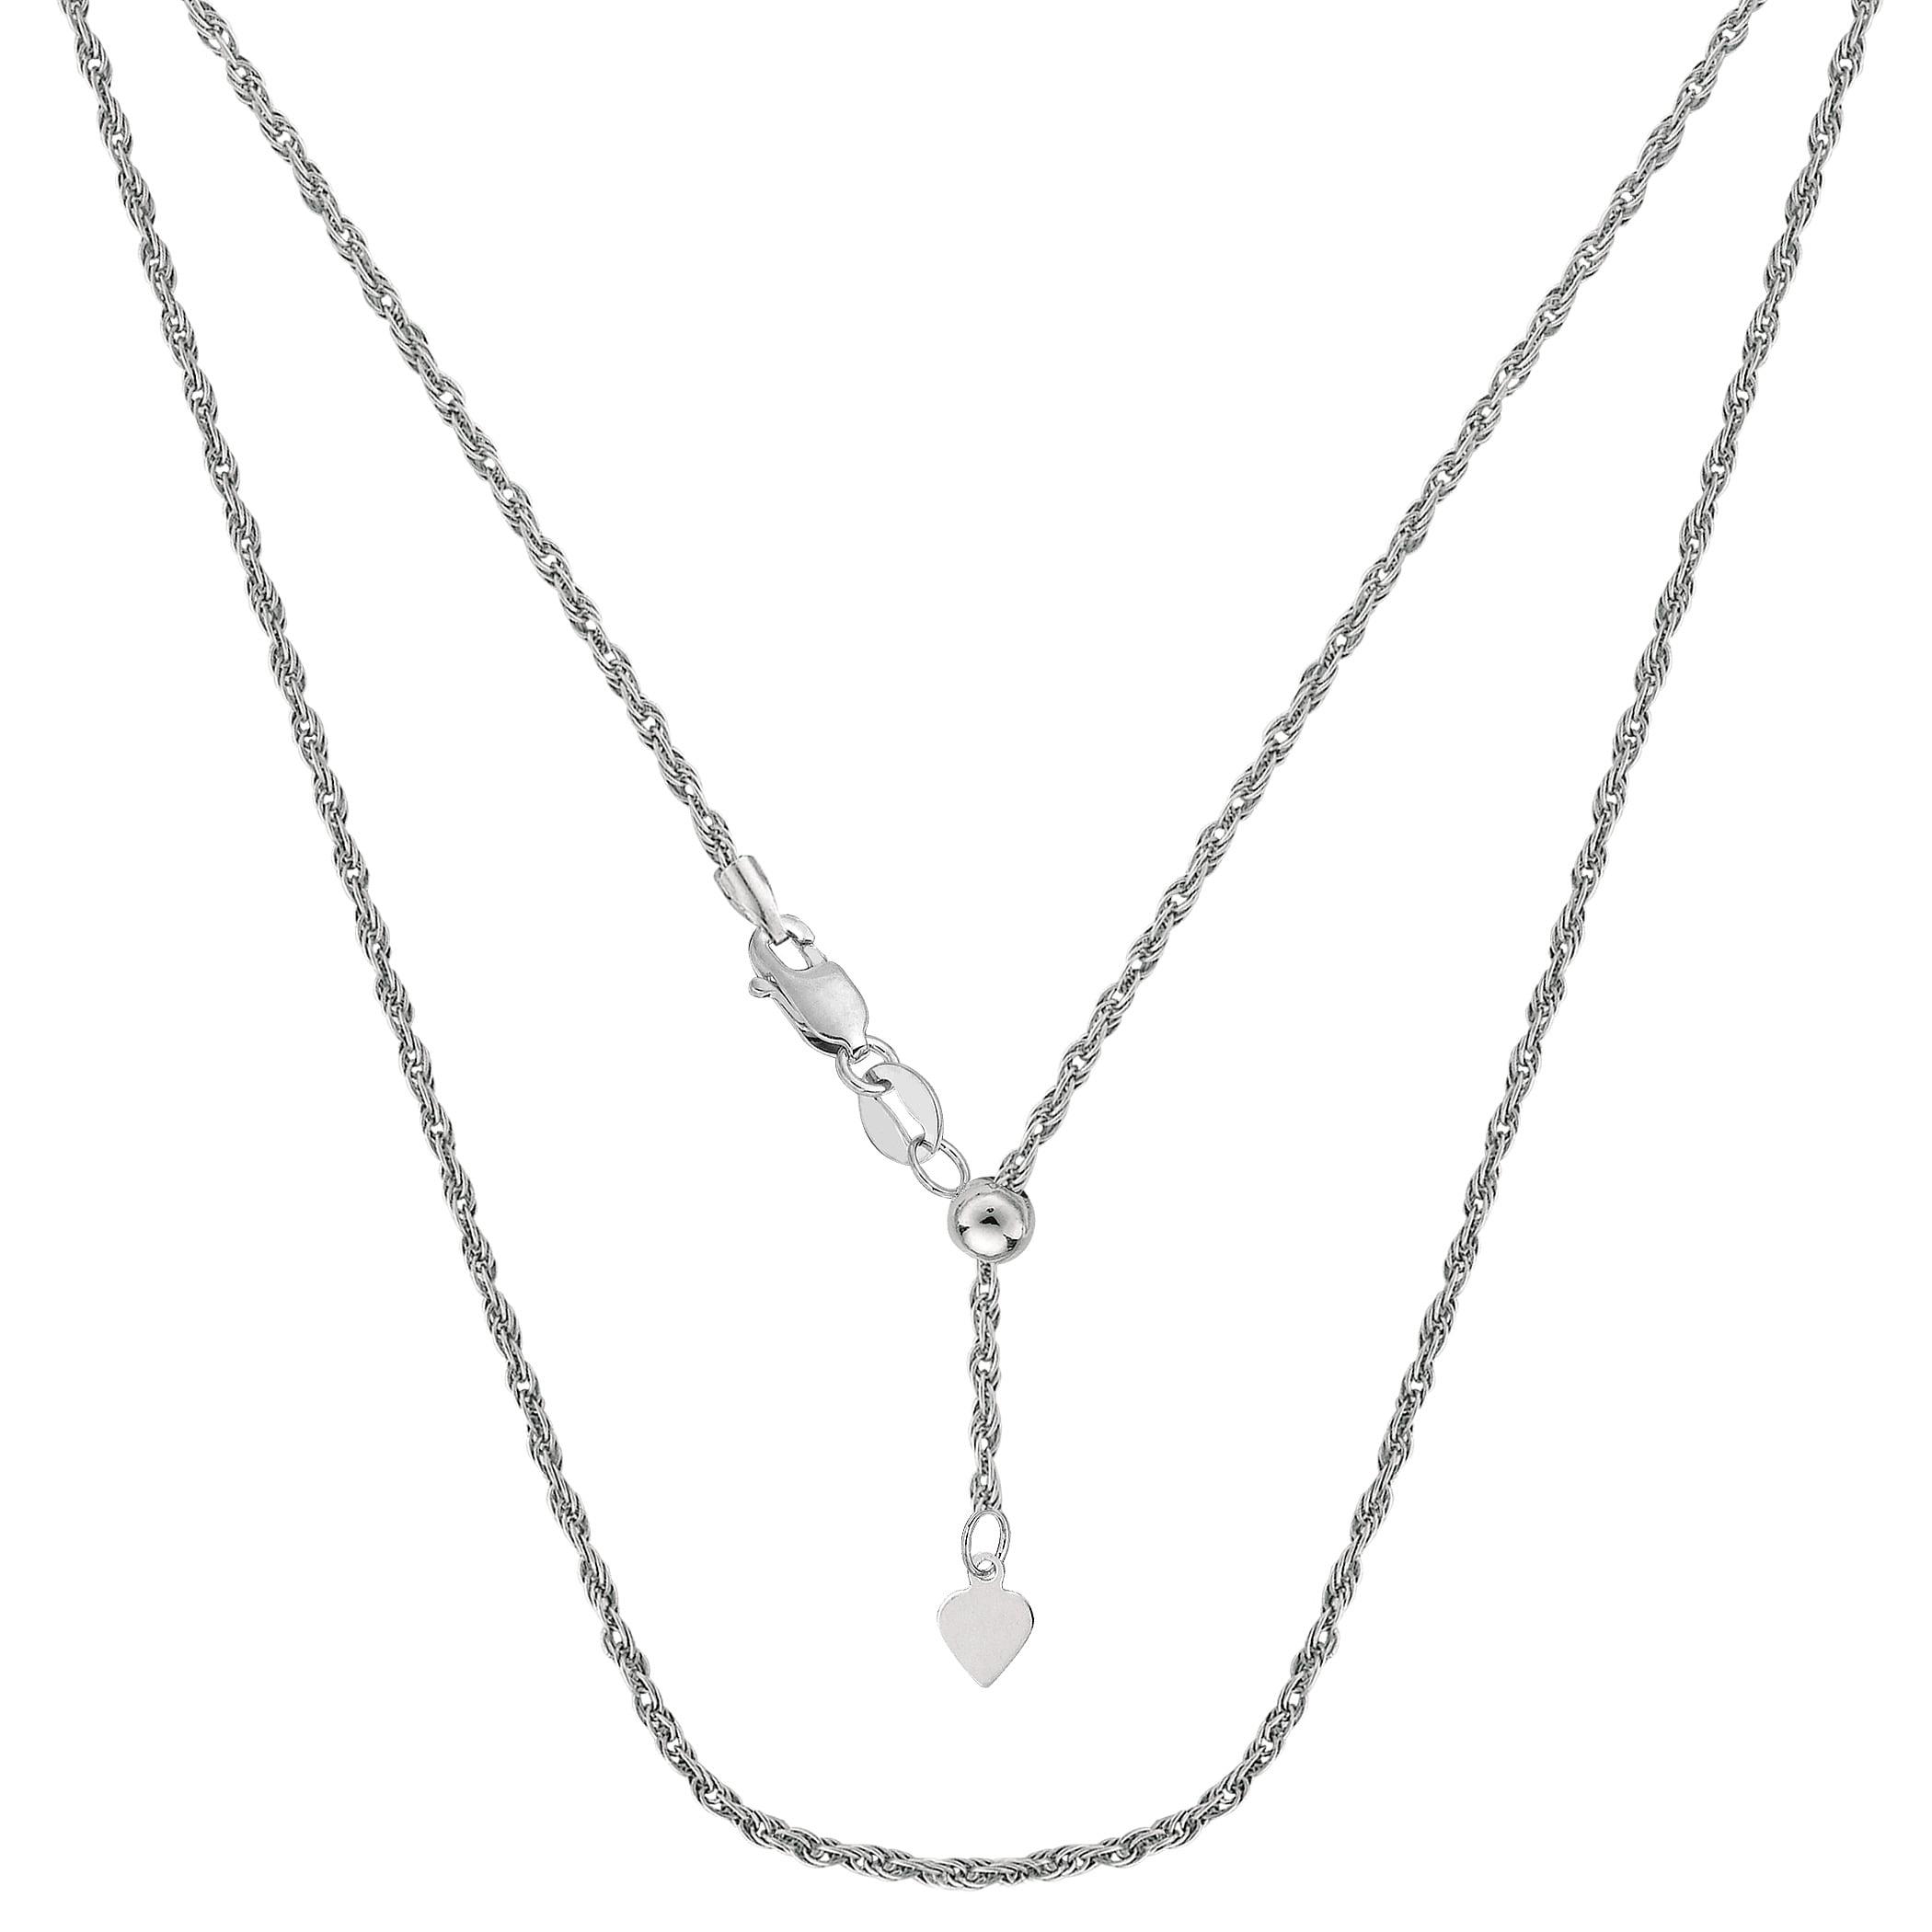 "JewelryAffairs 14k White Gold Adjustable Rope Chain Necklace, 1.0mm, 22"" by JewelryAffairs"